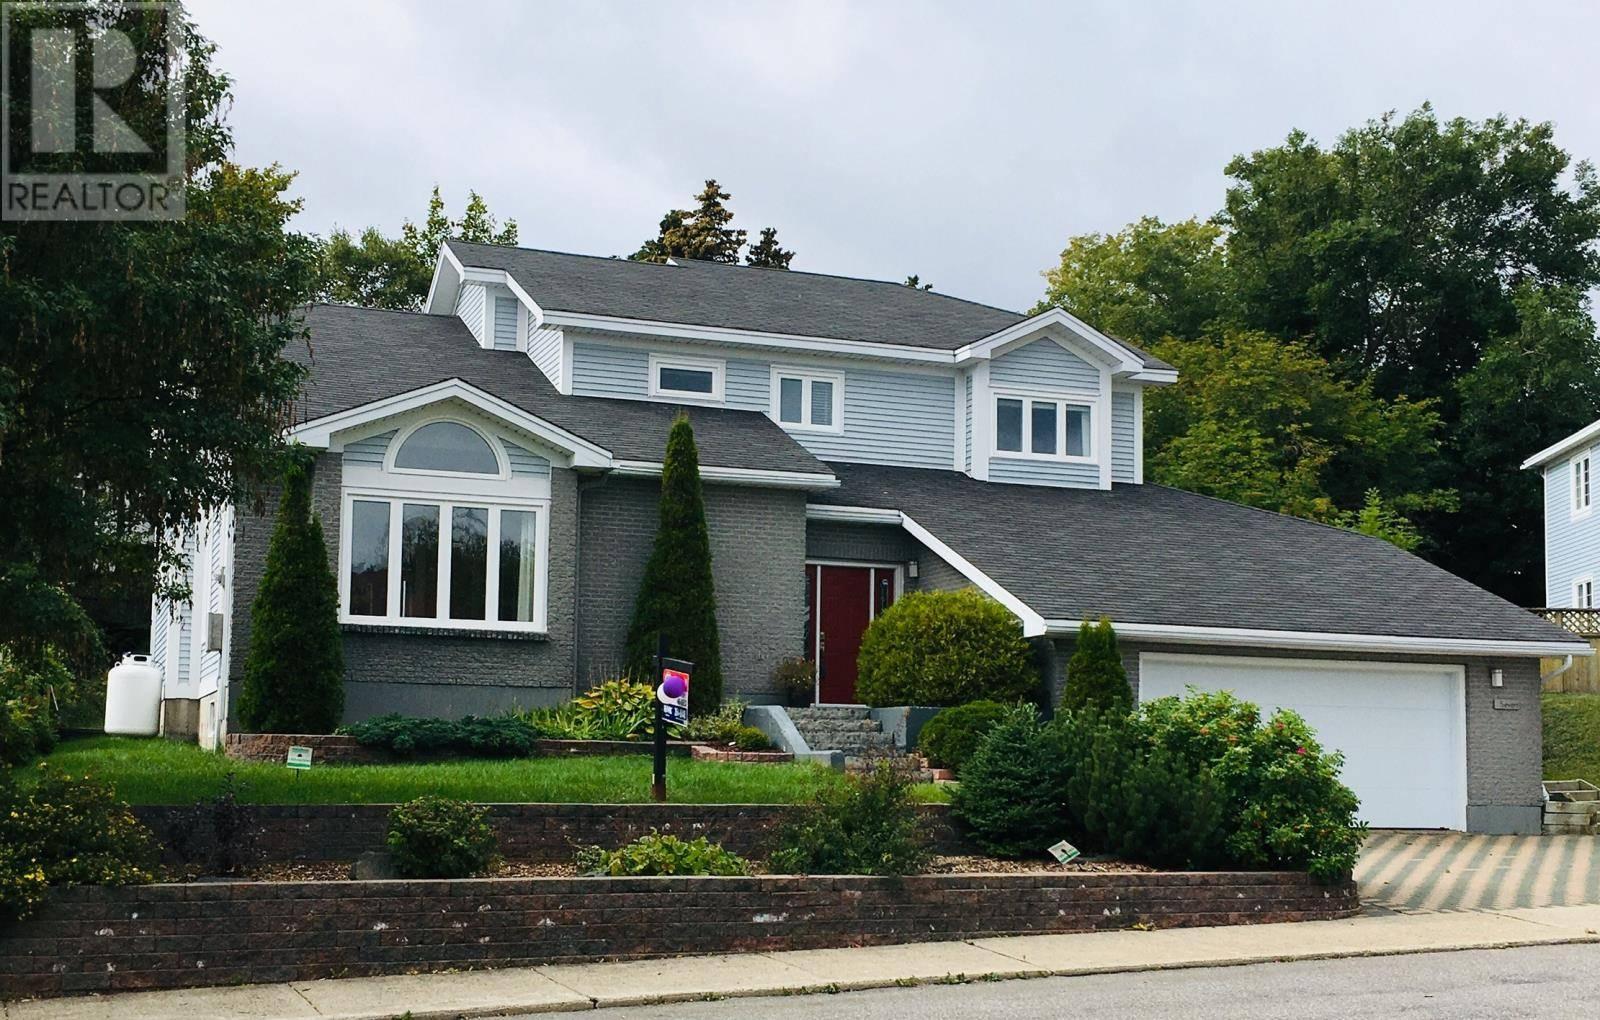 House for sale at 7 Gooseberry Pl St. John's Newfoundland - MLS: 1203349